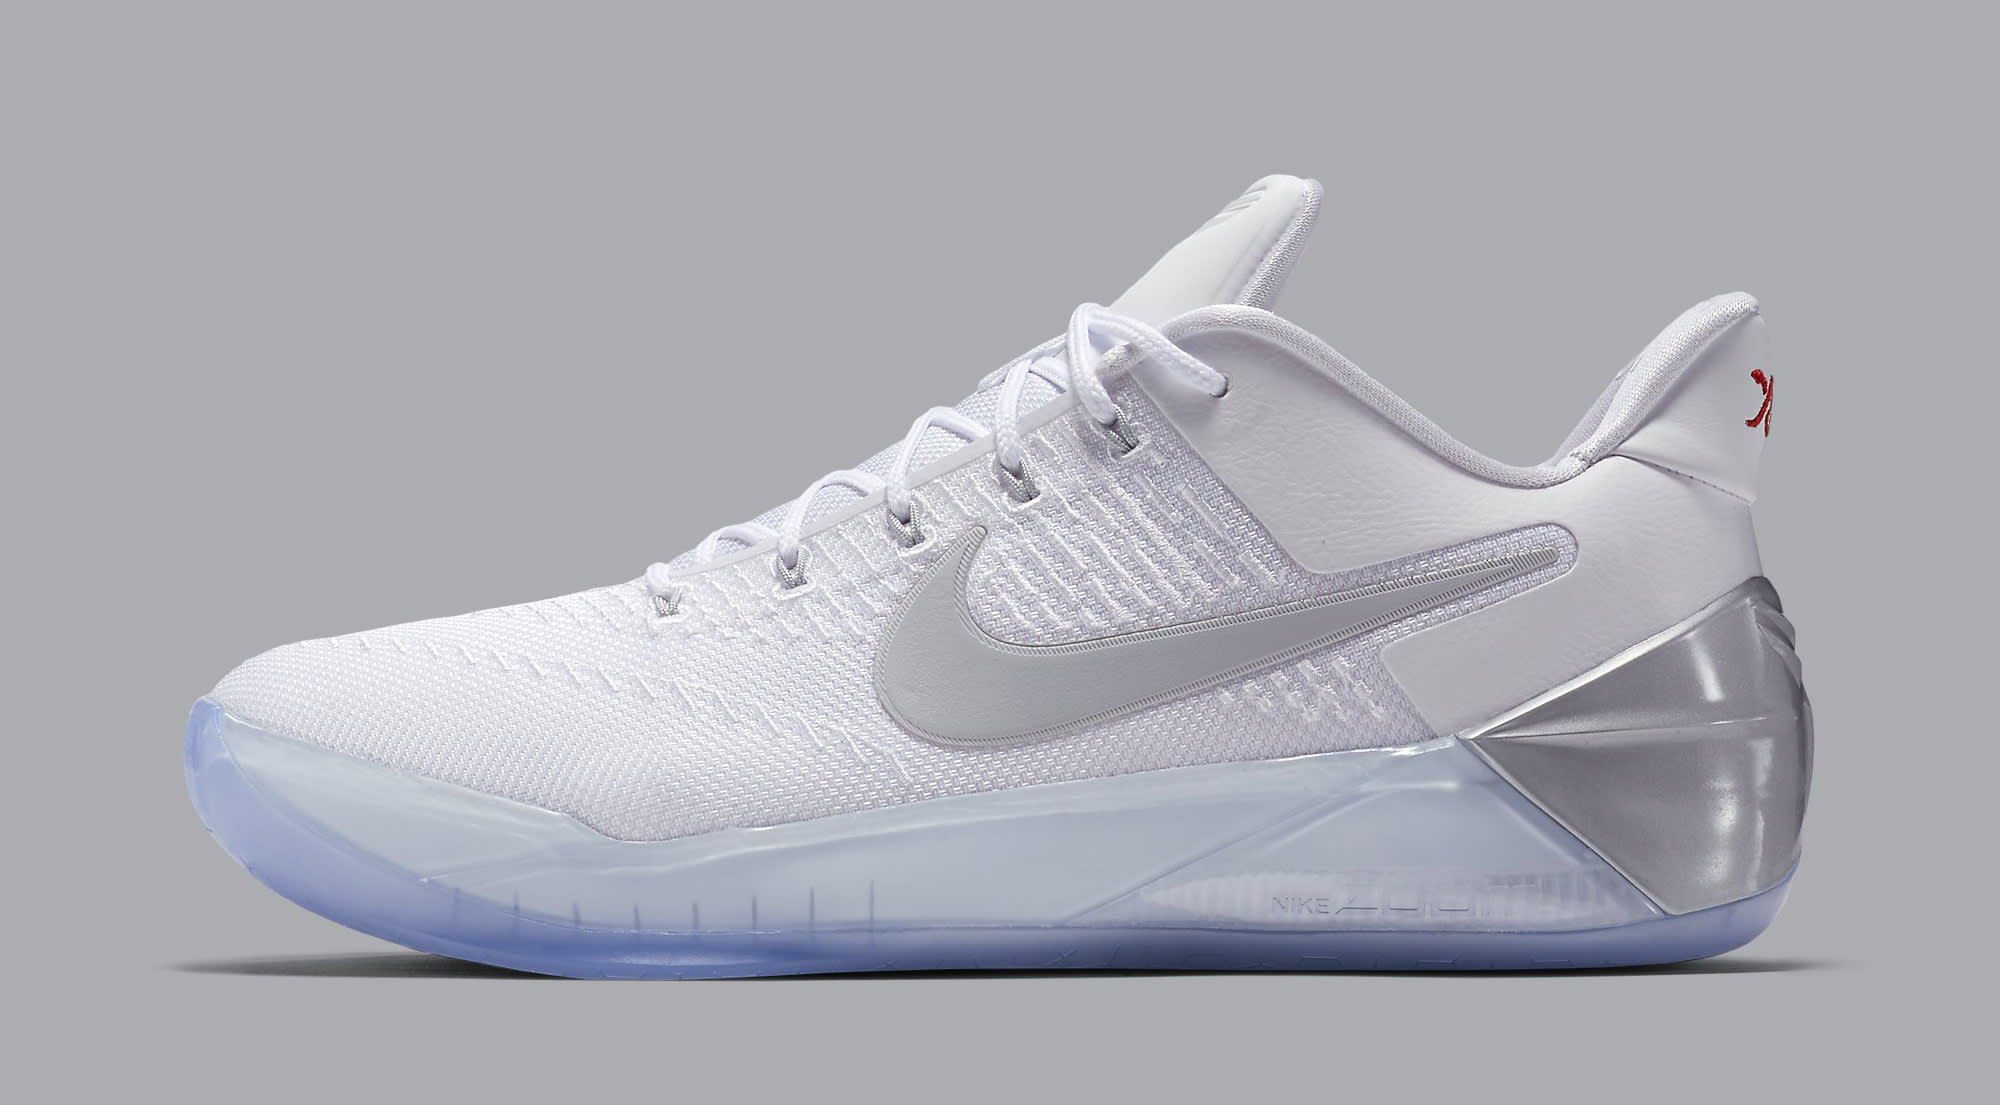 Nike Kobe AD White Silver 852427110 Profile